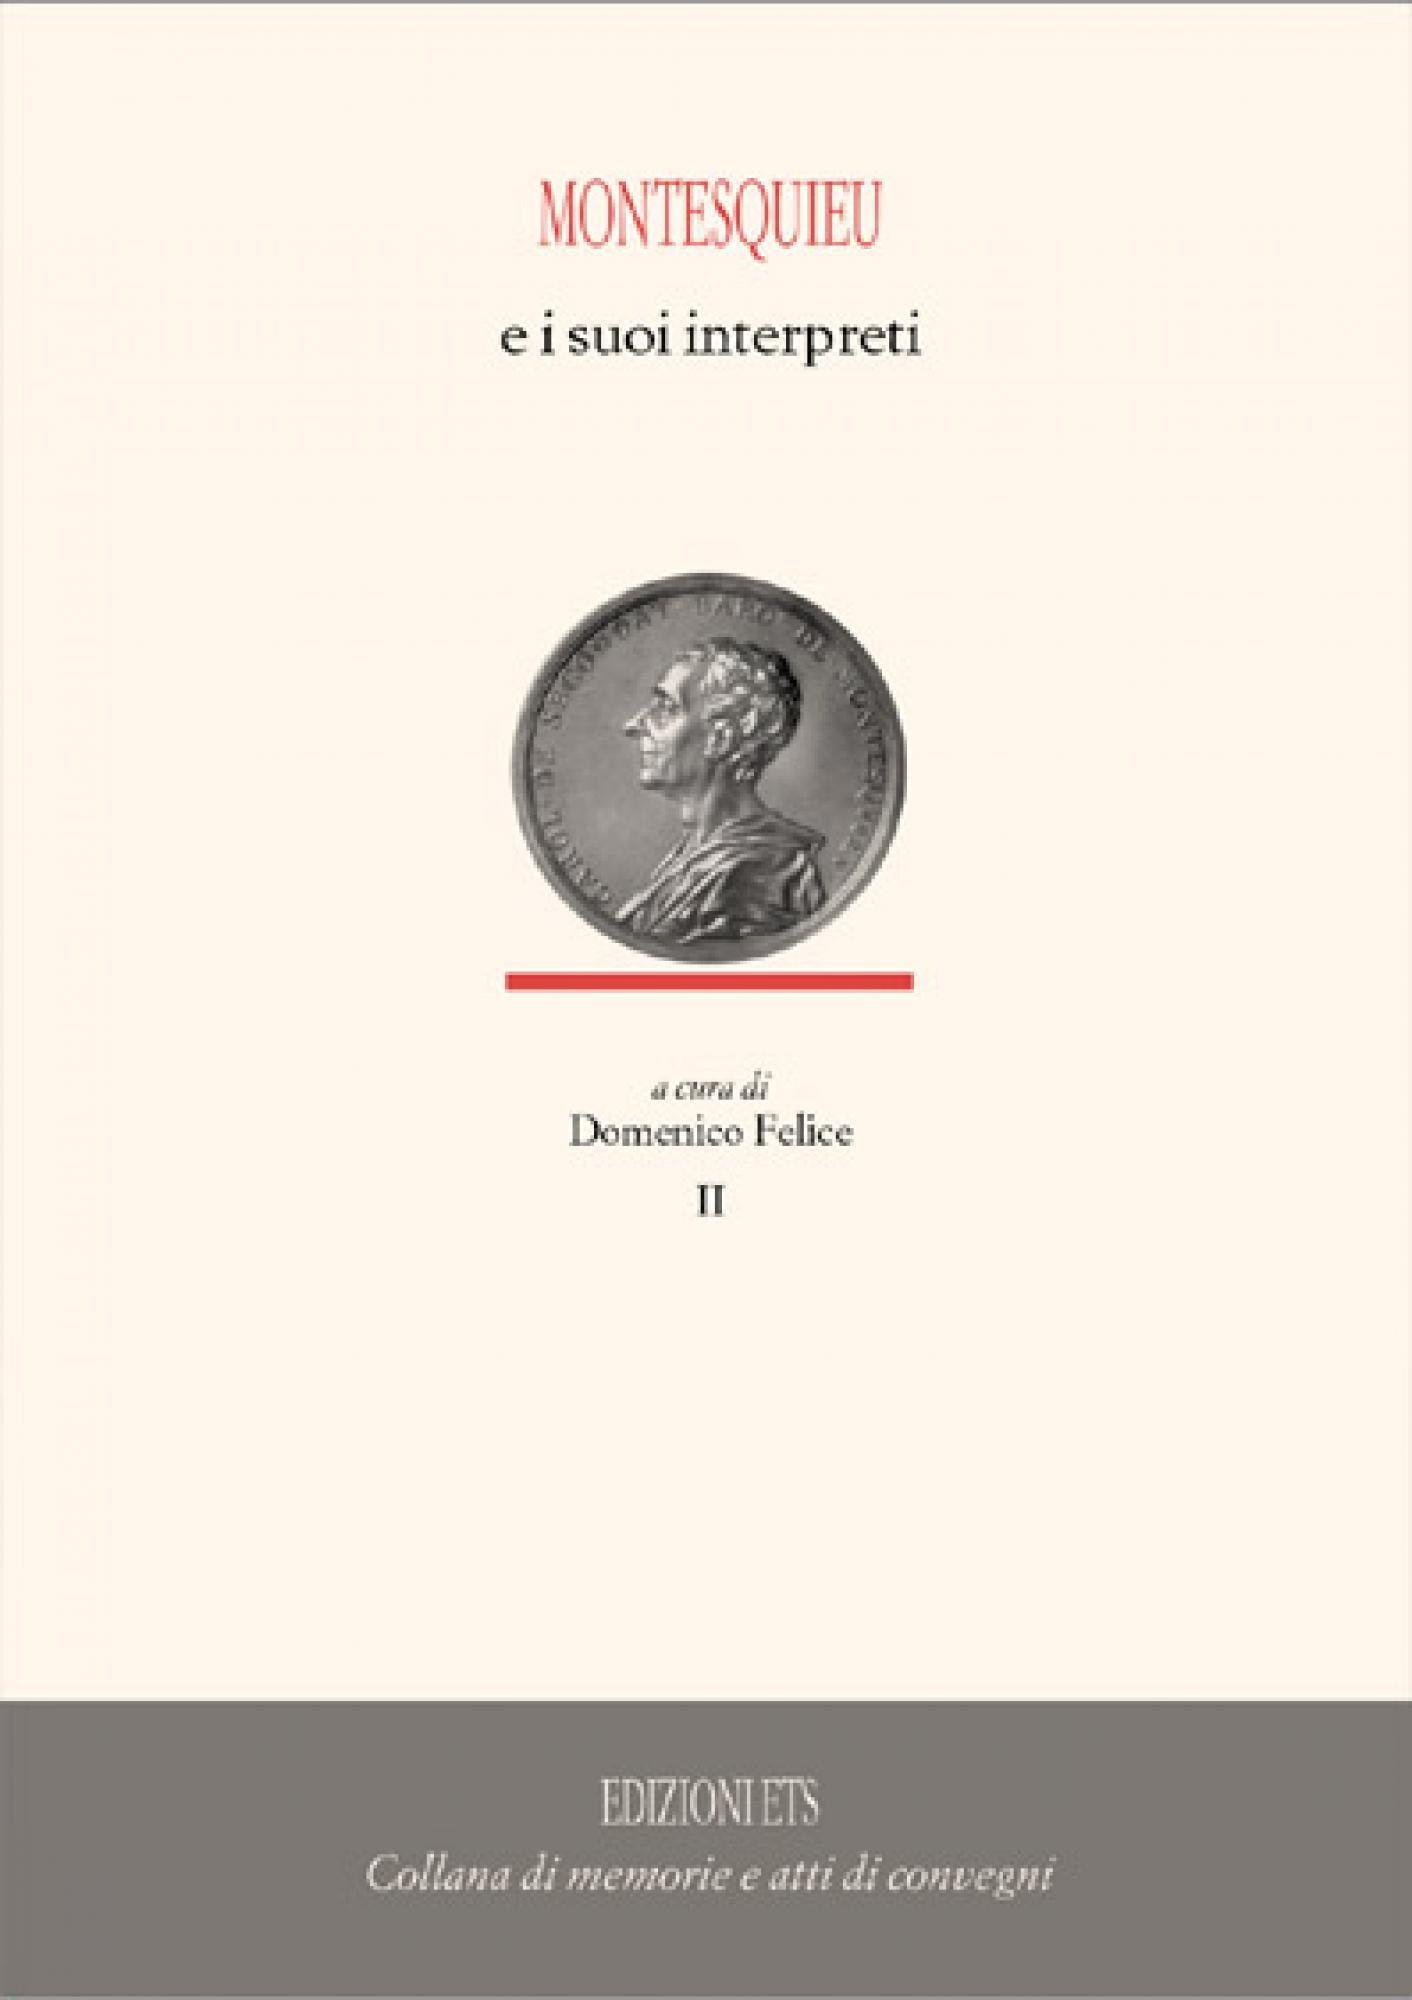 Montesquieu e i suoi interpreti I - II